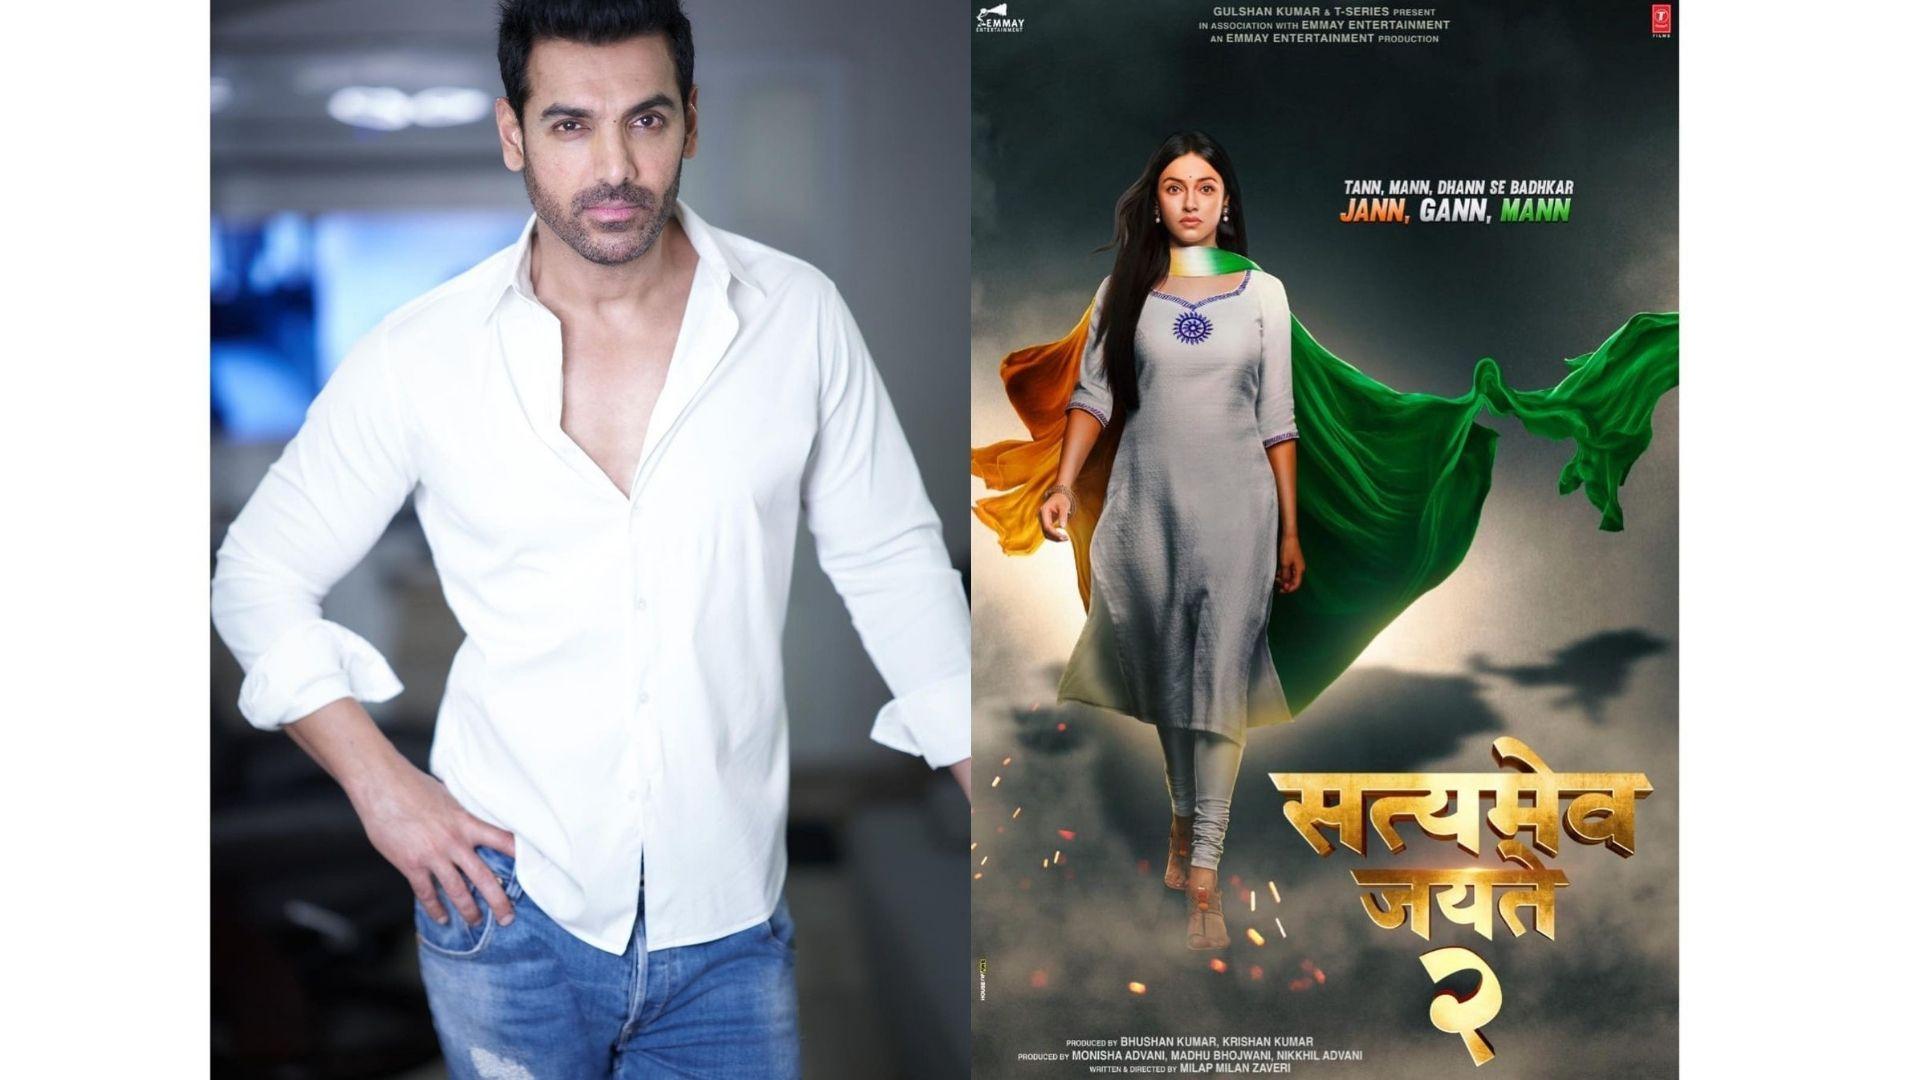 Satyameva Jayate 2: John Abraham, Divya Khosla Kumar Starrer Gets A Release Date